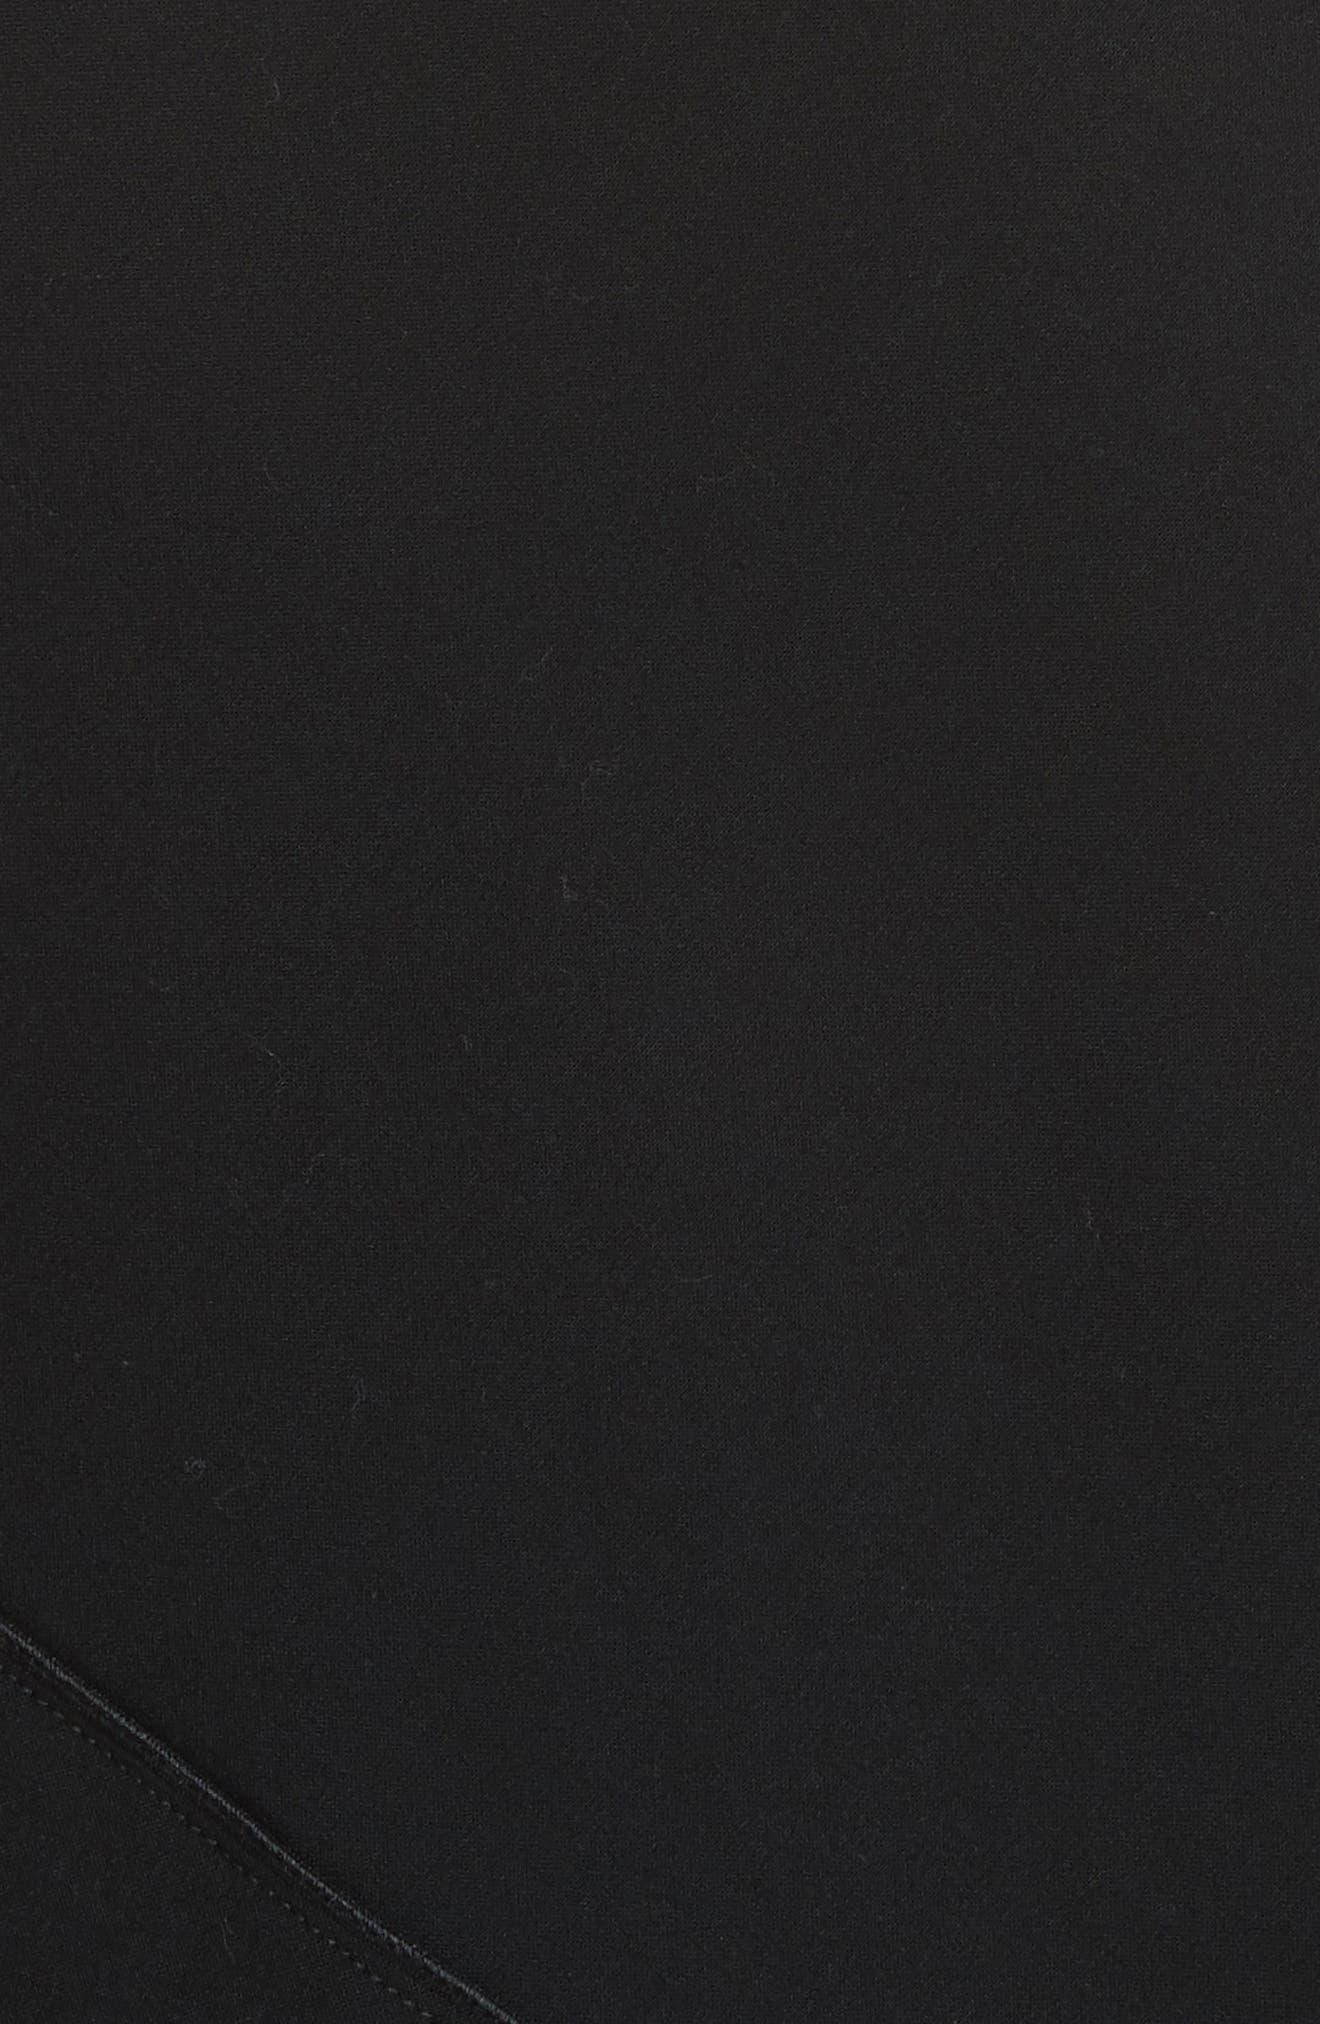 Double-Face Stretch Wool One-Shoulder Dress,                             Alternate thumbnail 6, color,                             Black